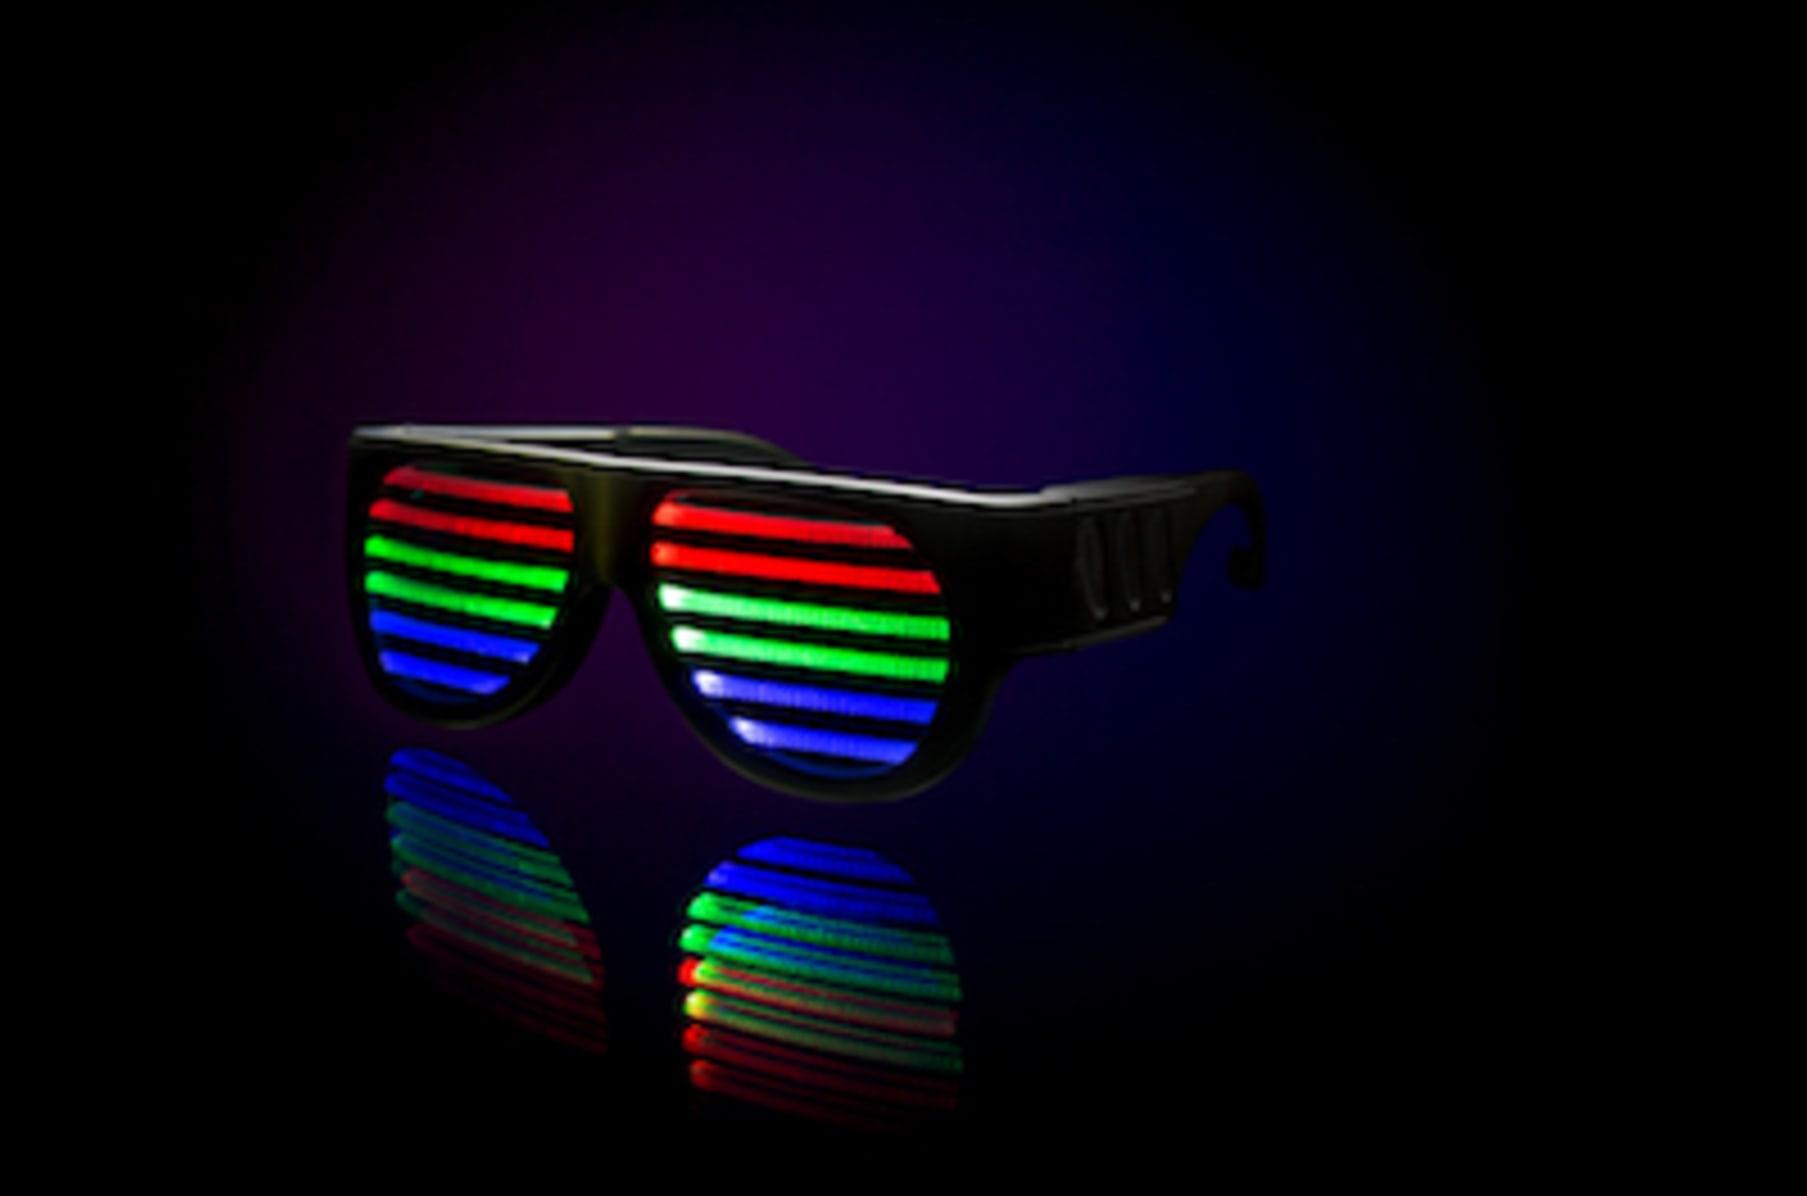 DropShades Audio-Responsive LED Glasses